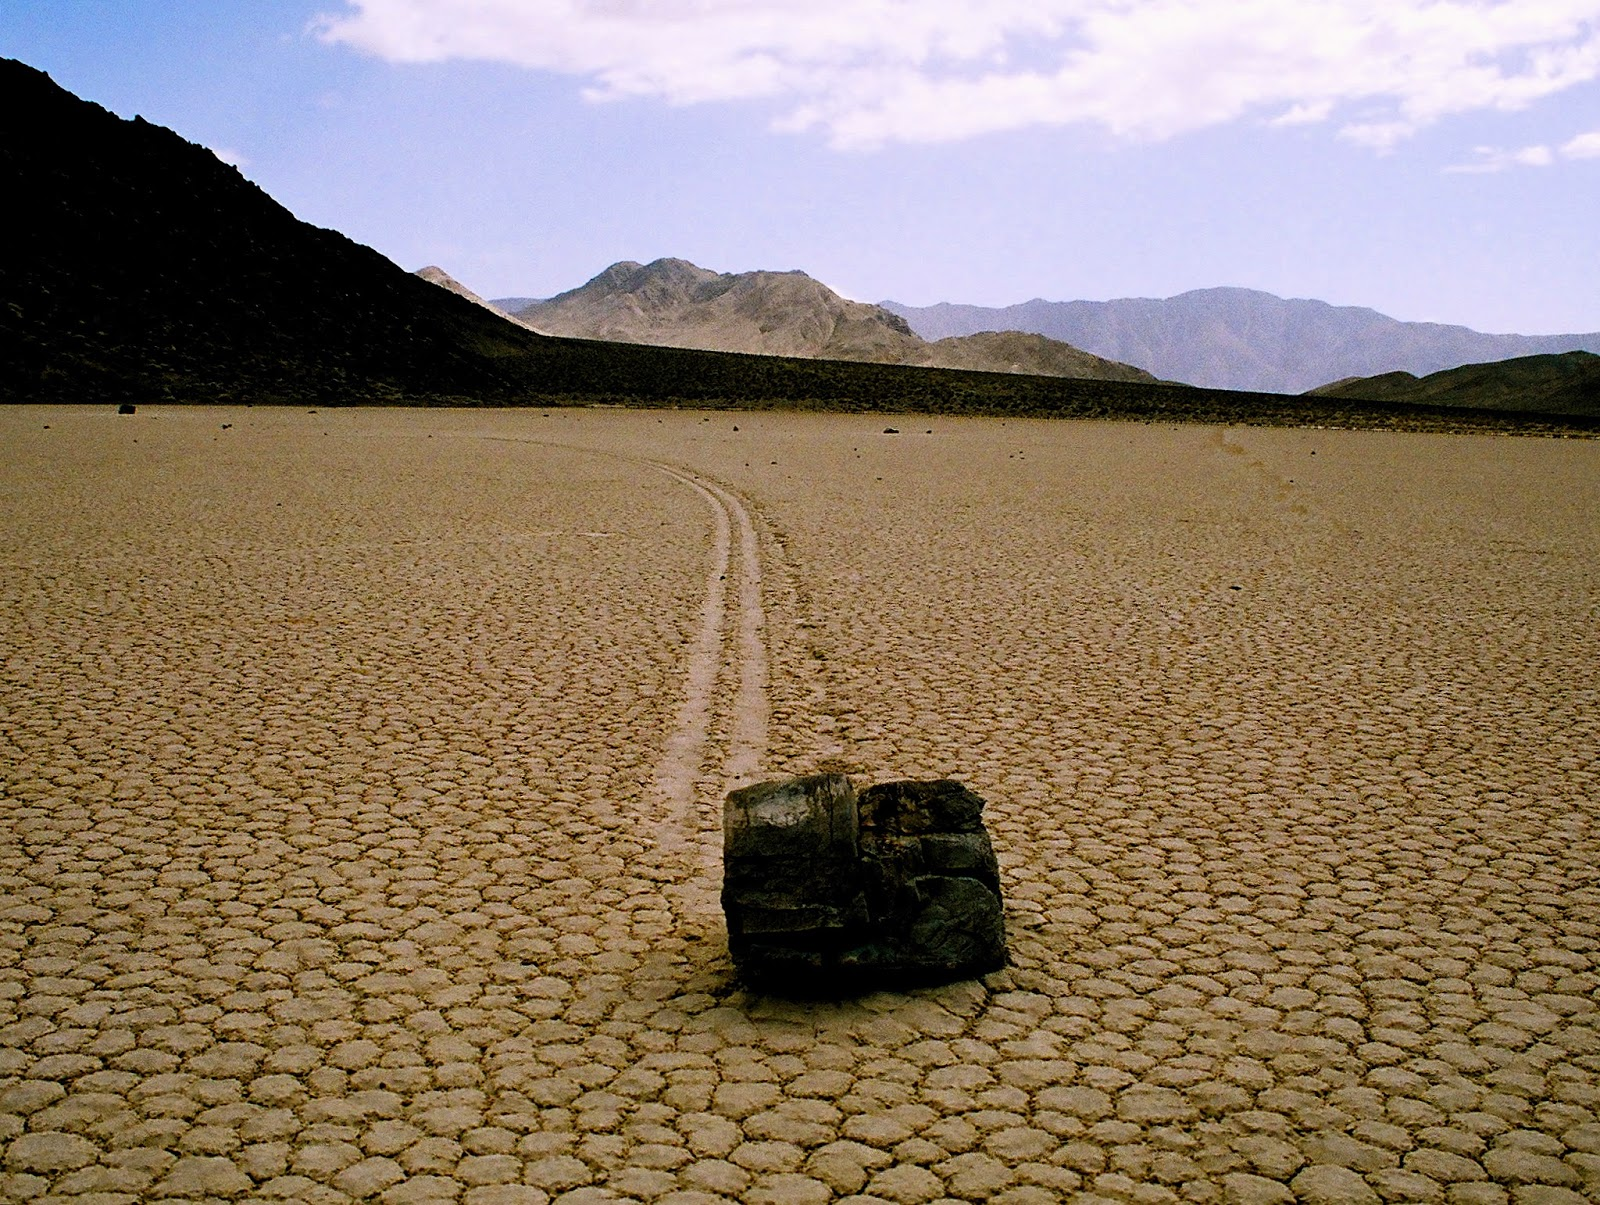 roca que se mueve sola